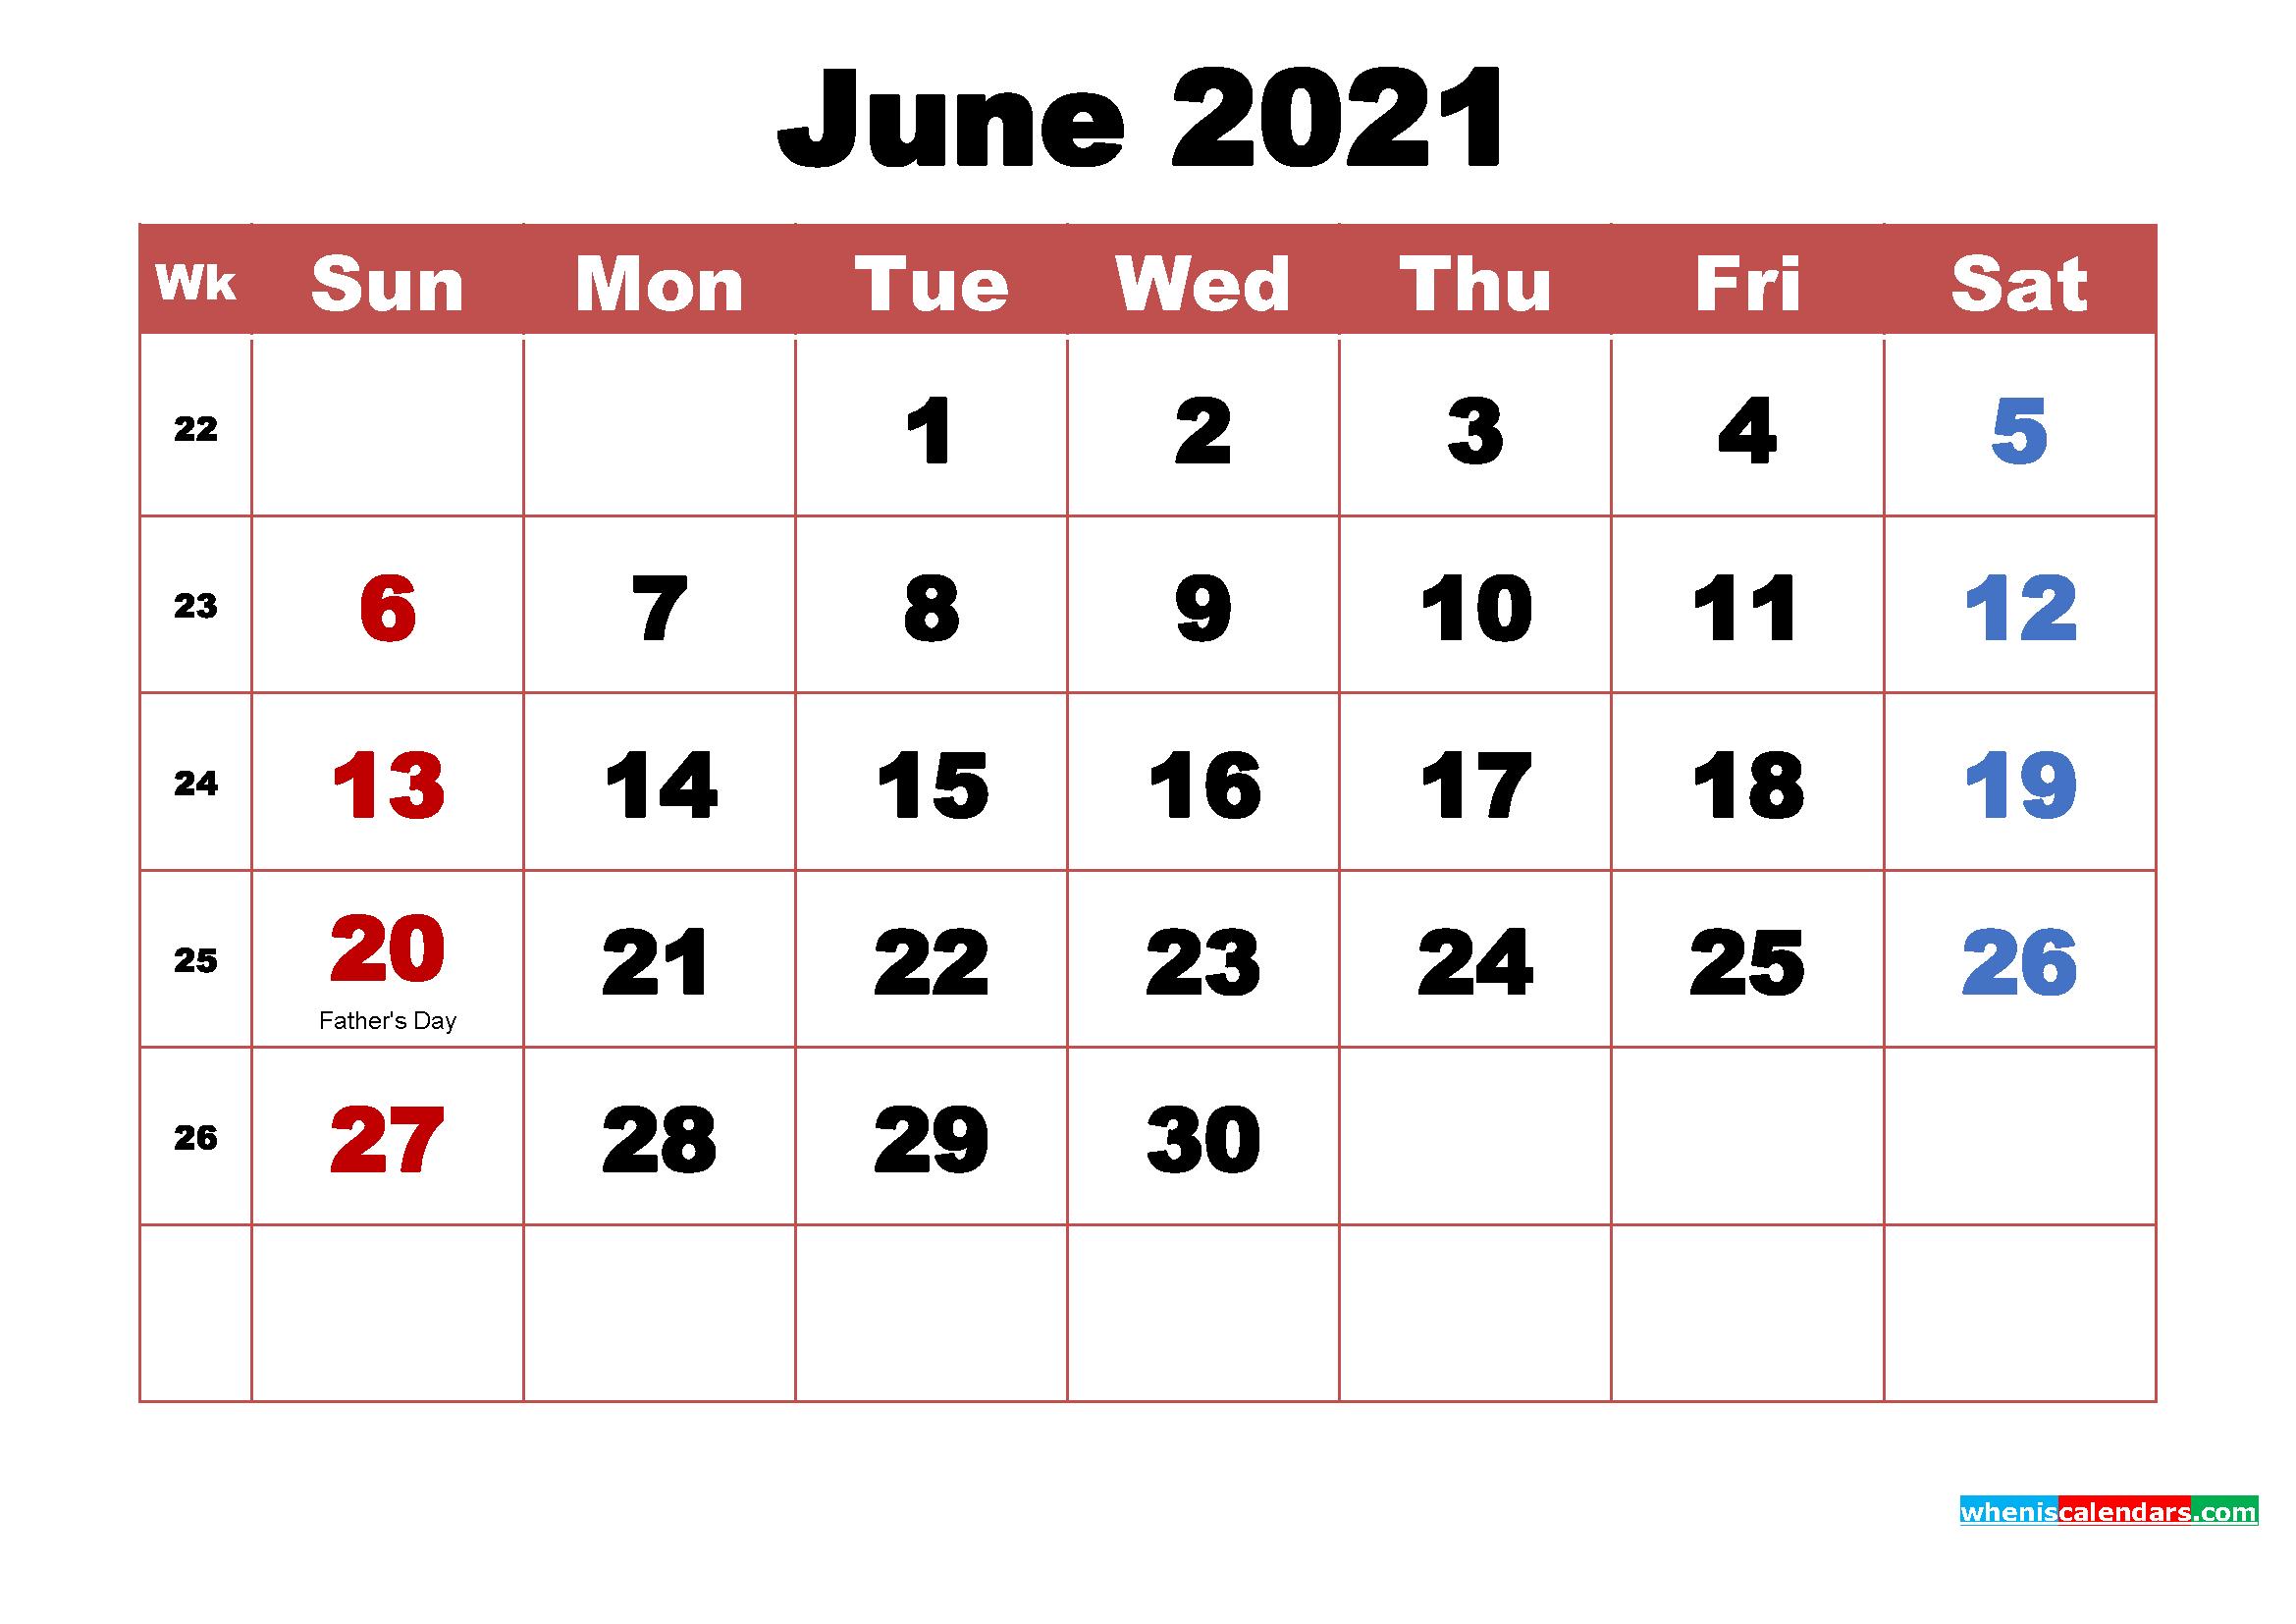 June 2021 Calendar With Holidays   Free 2021 Printable